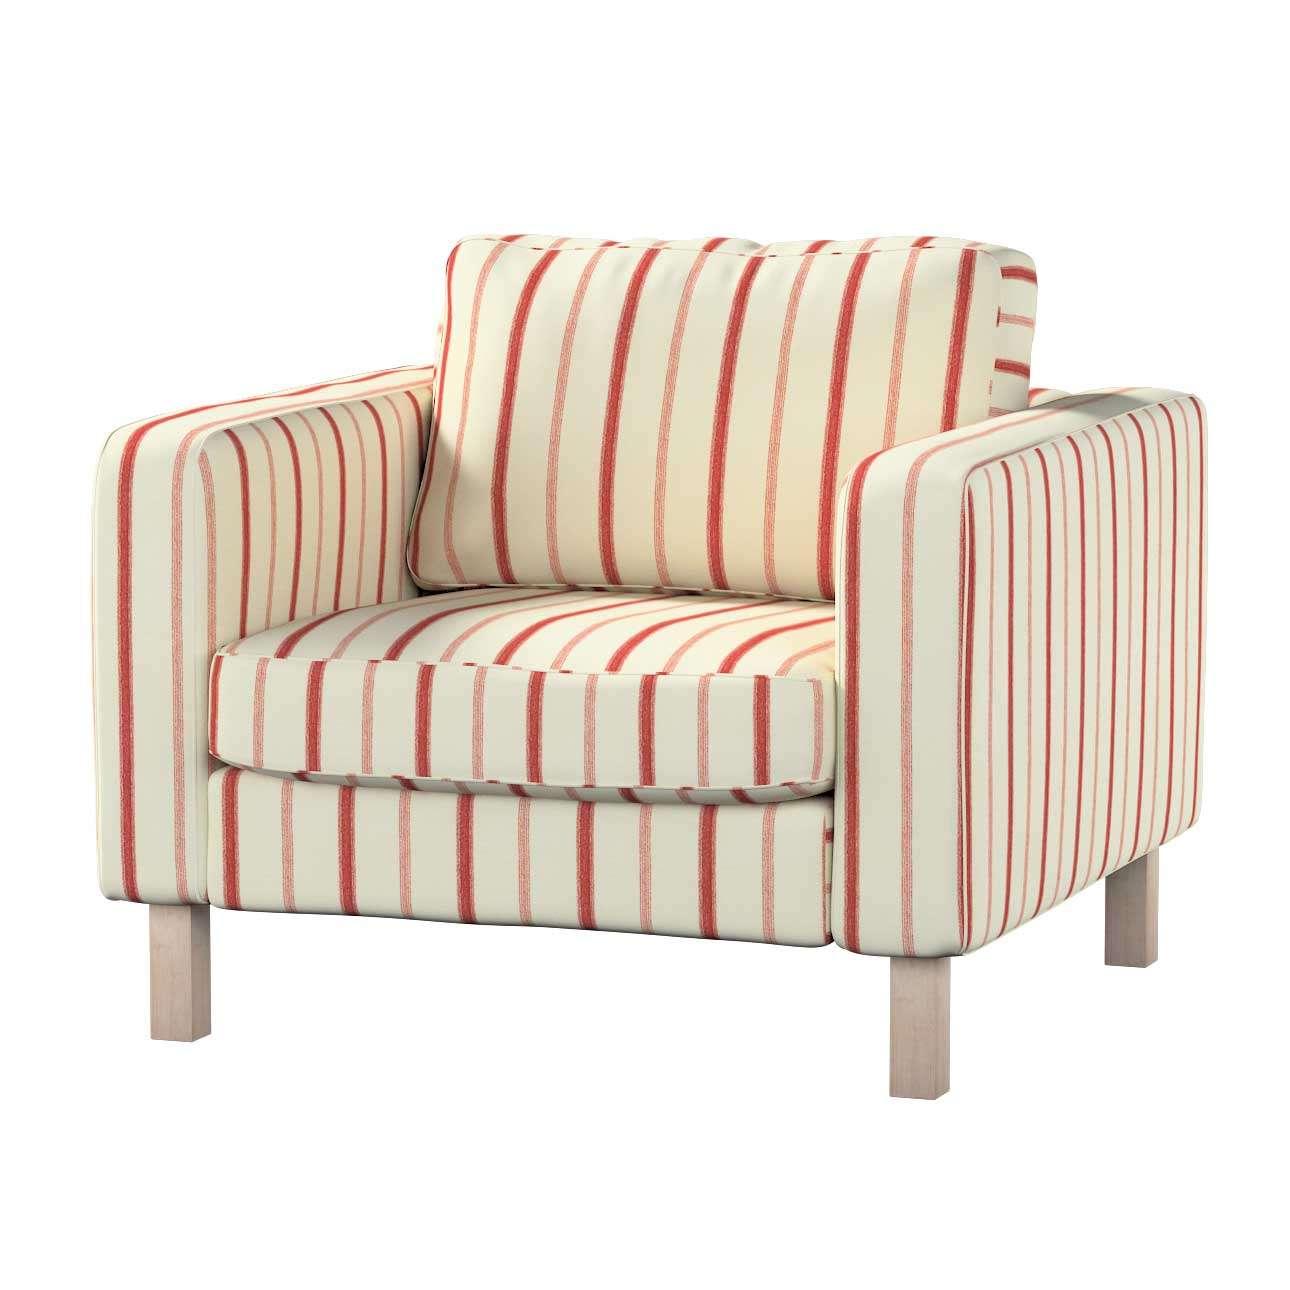 Pokrowiec na fotel Karlstad, krótki Fotel Karlstad w kolekcji Avinon, tkanina: 129-15